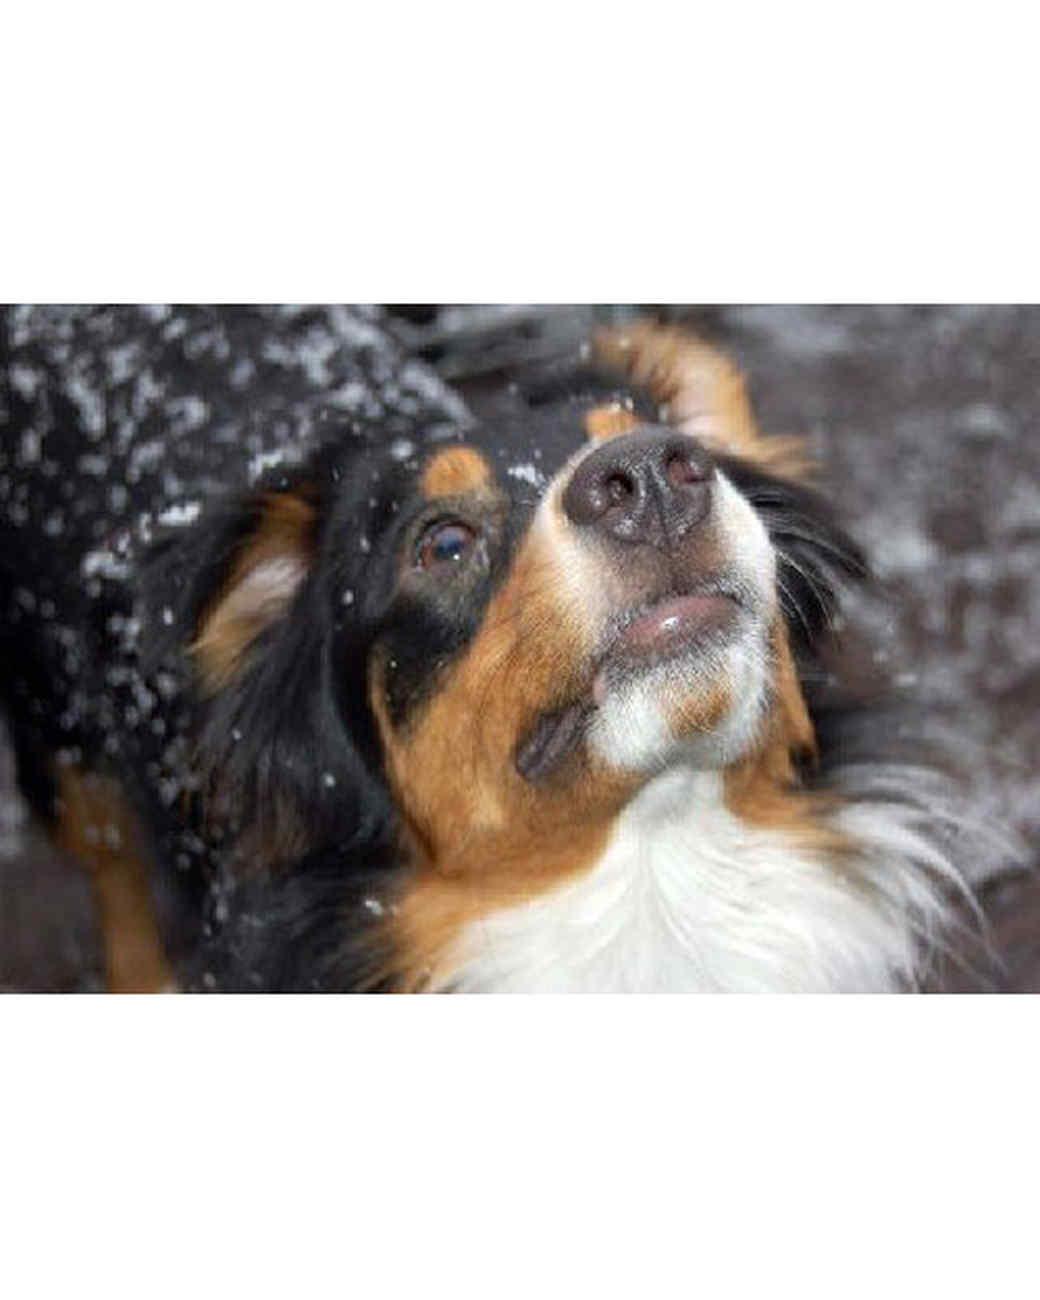 pets_snowangels_7253819_122717_11169189.jpg